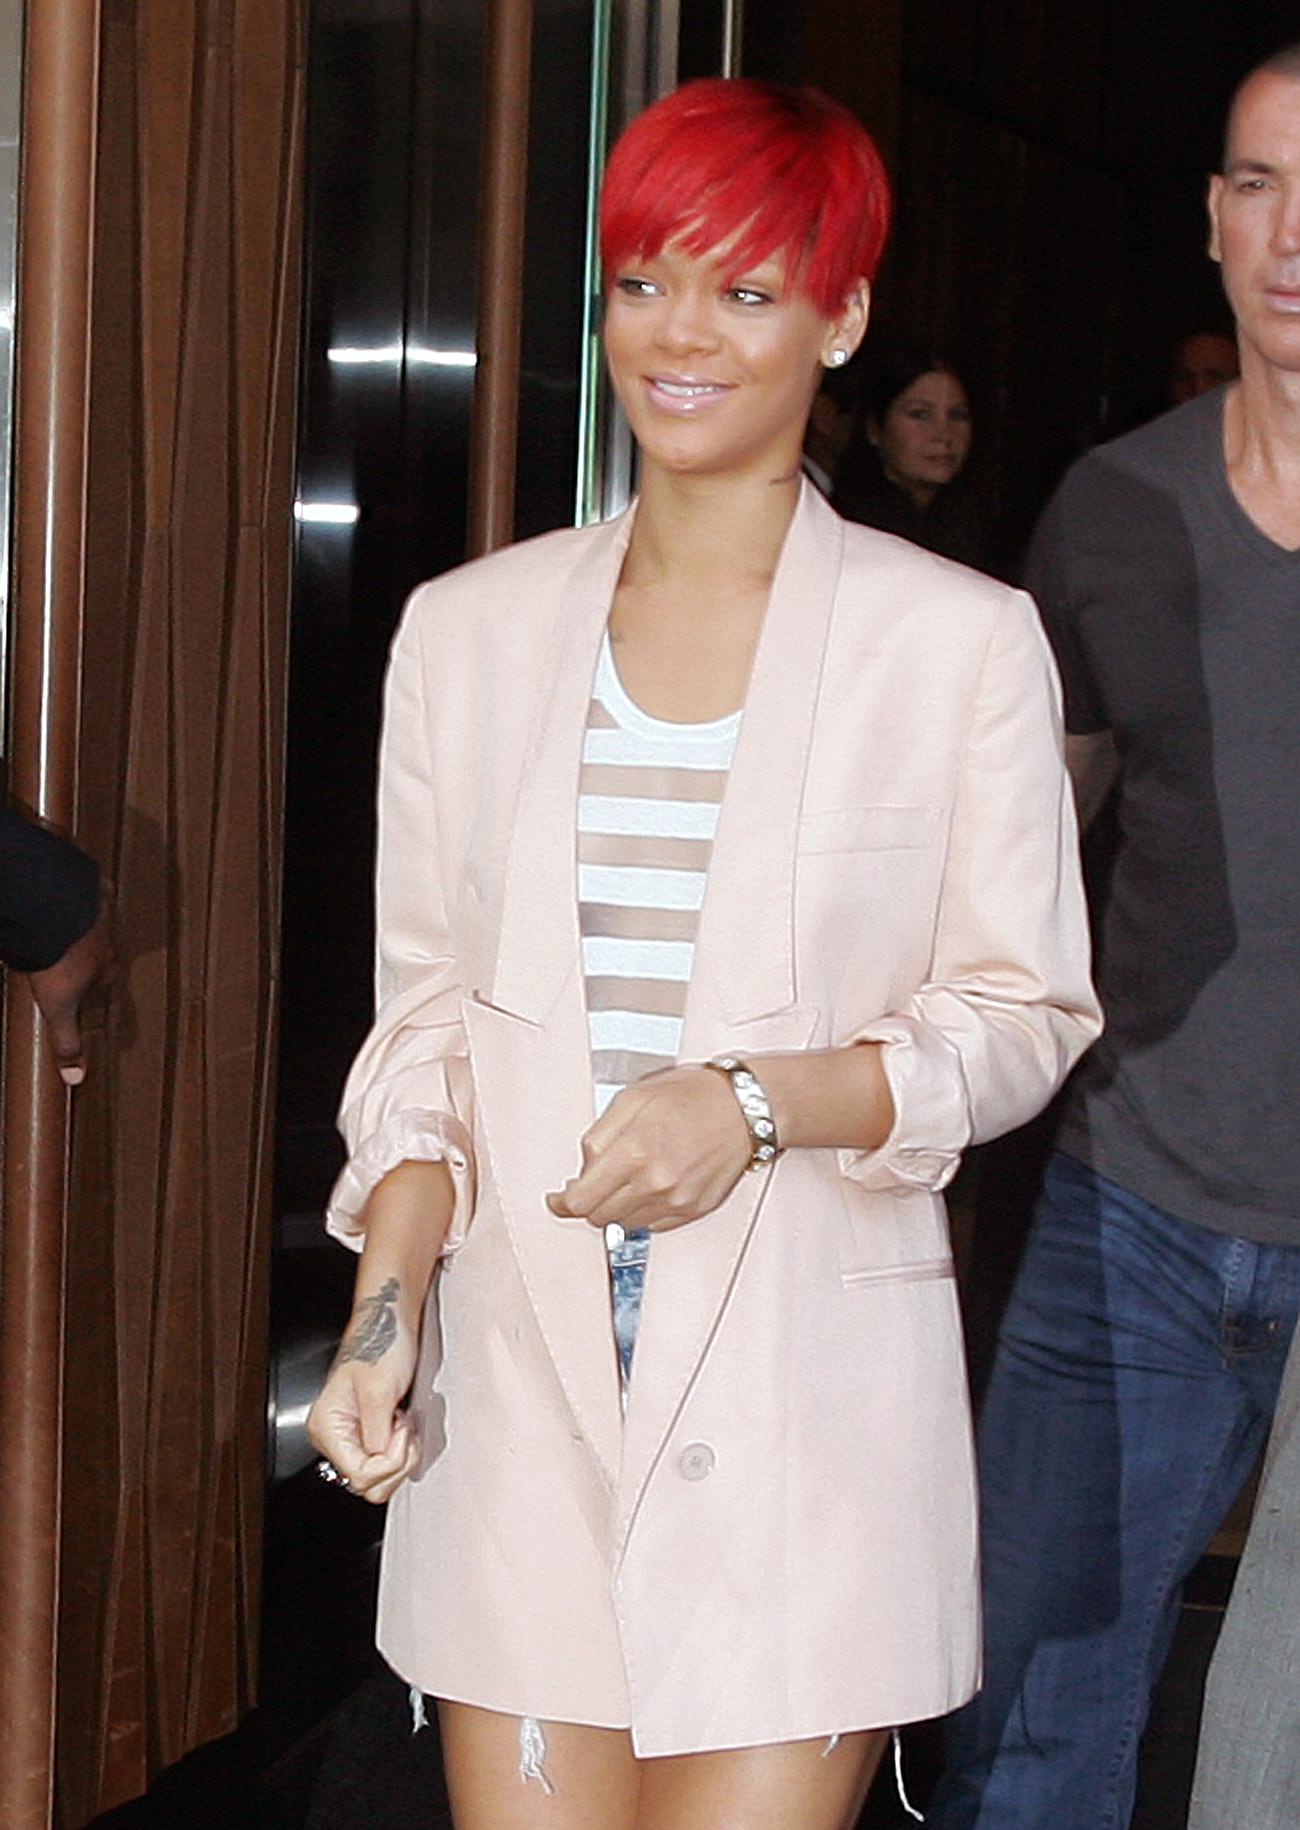 11891_Rihanna2010_08_11_leavestheTrumpSohohotelinNY.com_TheElder_Rihanna2010_08_11_leavestheTrumpSohohotelinNY34_122_566lo.jpg